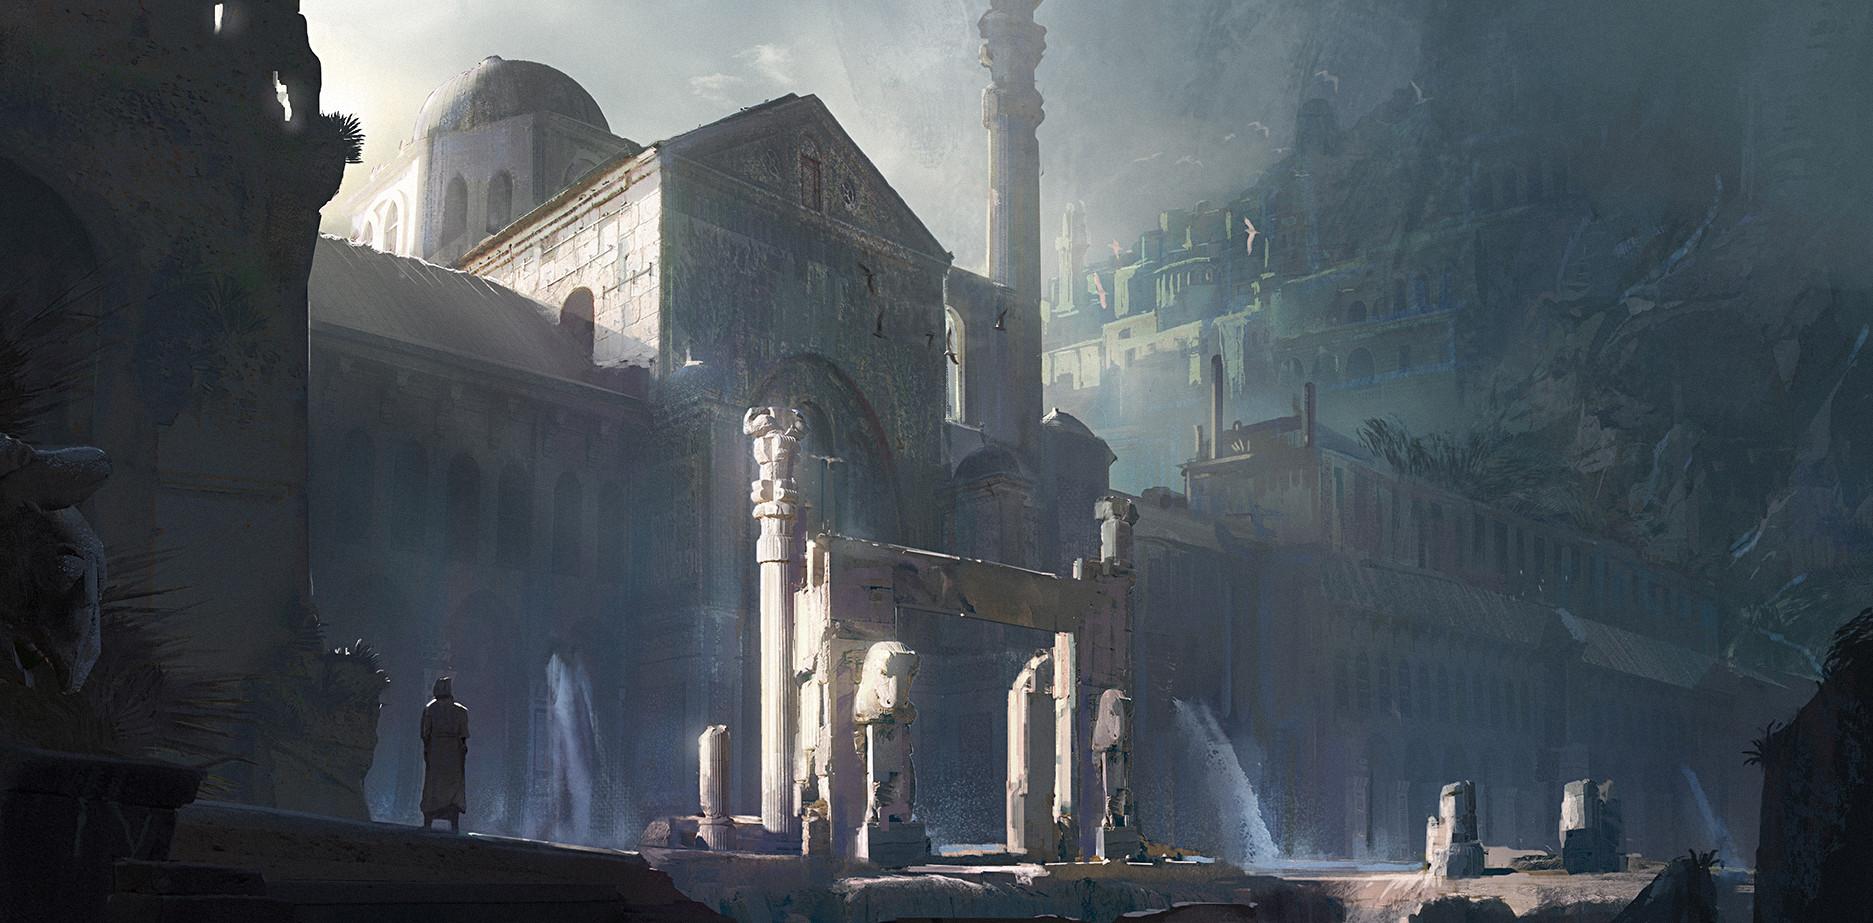 Liang mark persian palace04 6jpg